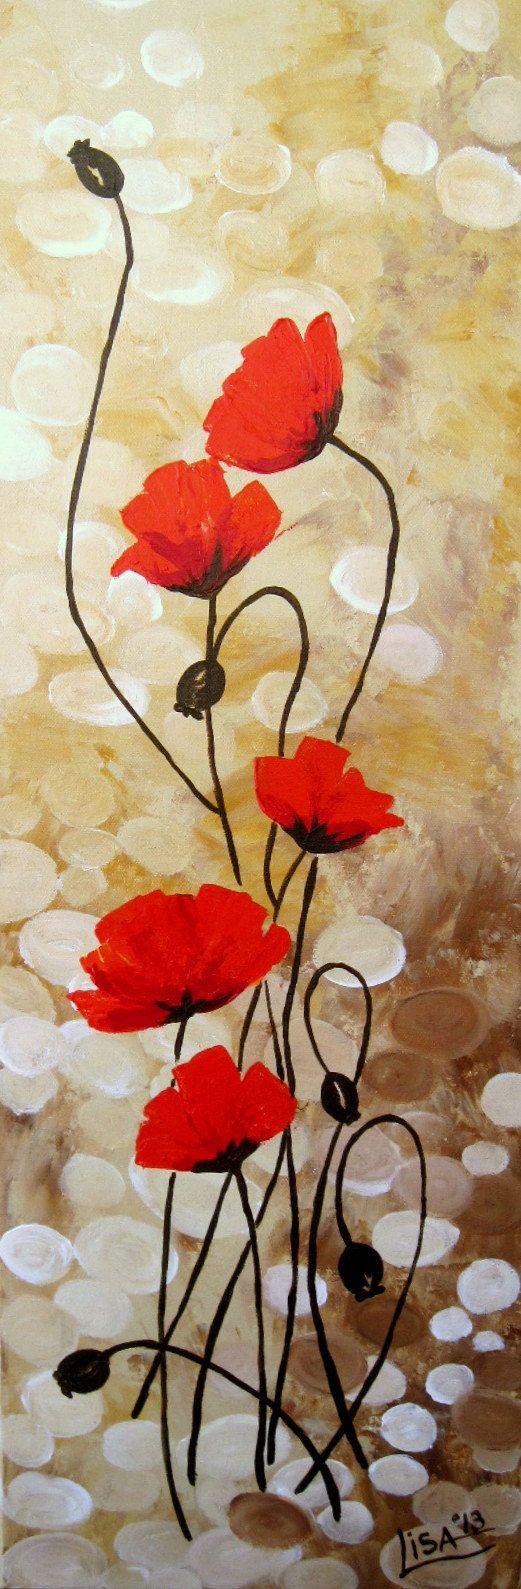 Original Acrylbild Roter Mohn Blumen-Felder von ArtonlineGallery